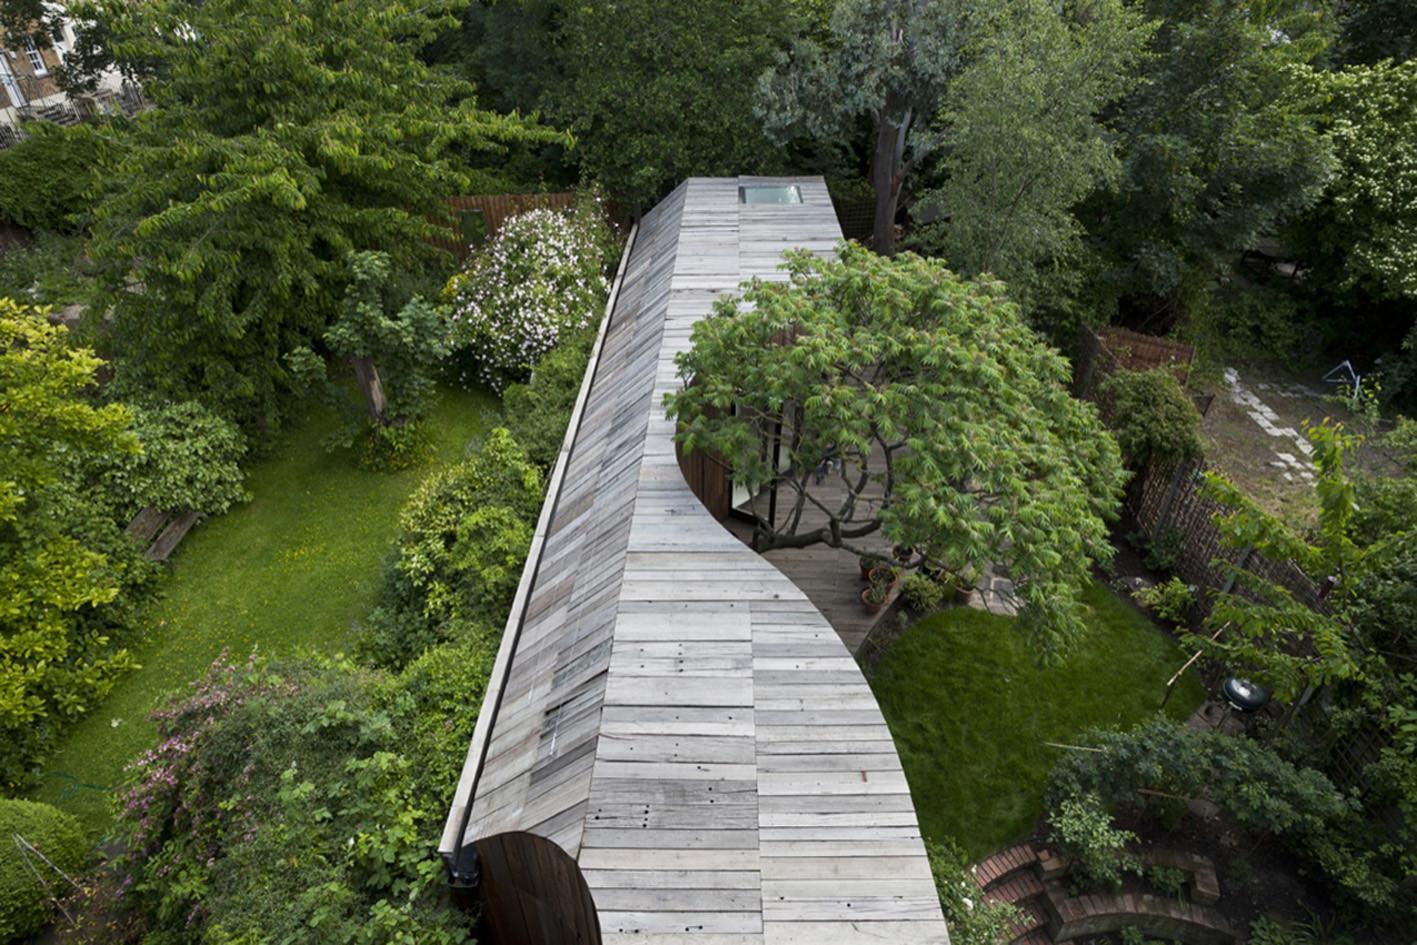 Casa del árbol  / 6a Architects, © Johan Dehlin